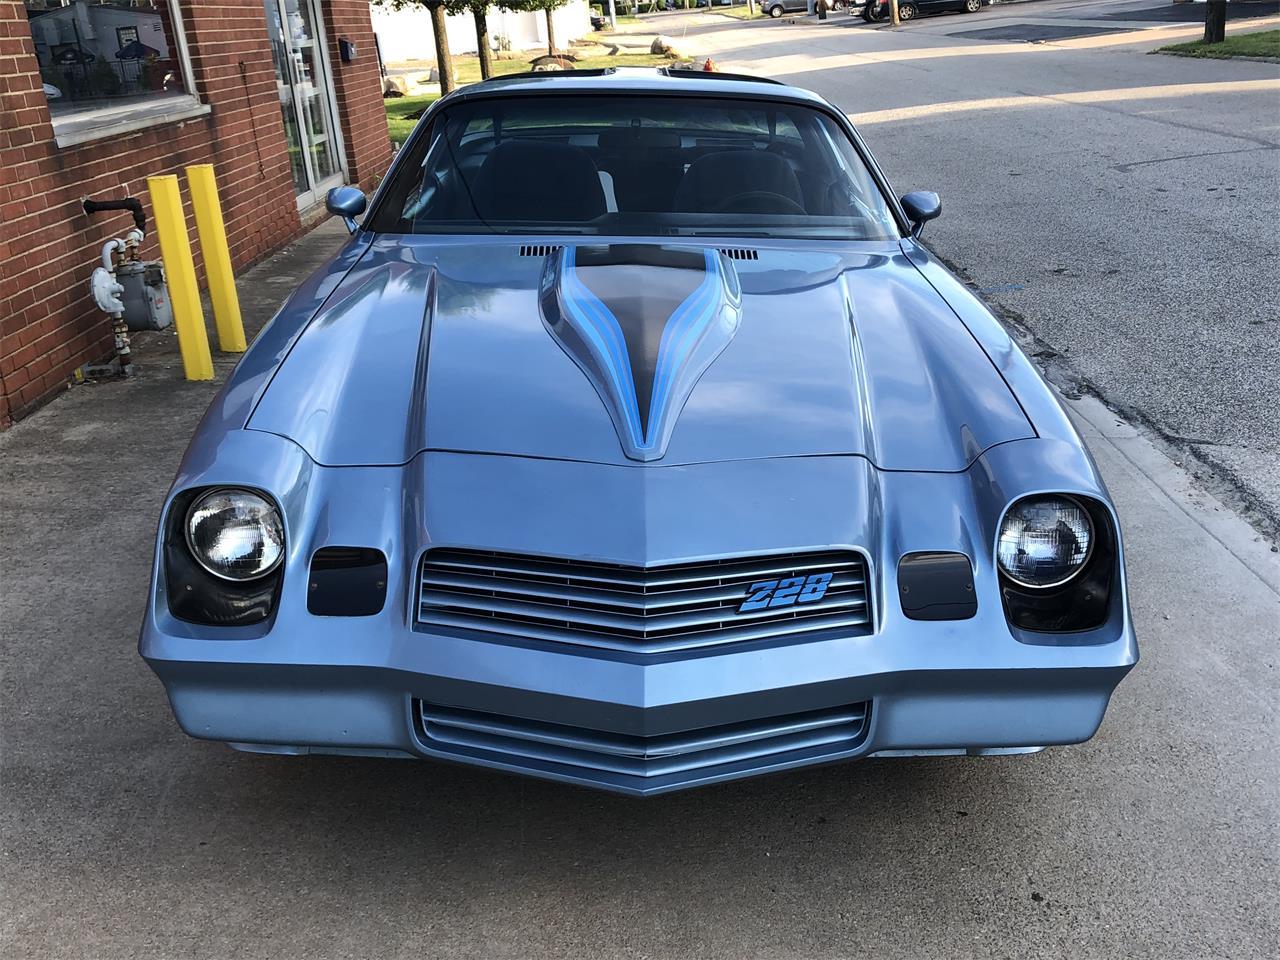 1981 Chevrolet Camaro Z28 (CC-1369454) for sale in Willoughby , Ohio